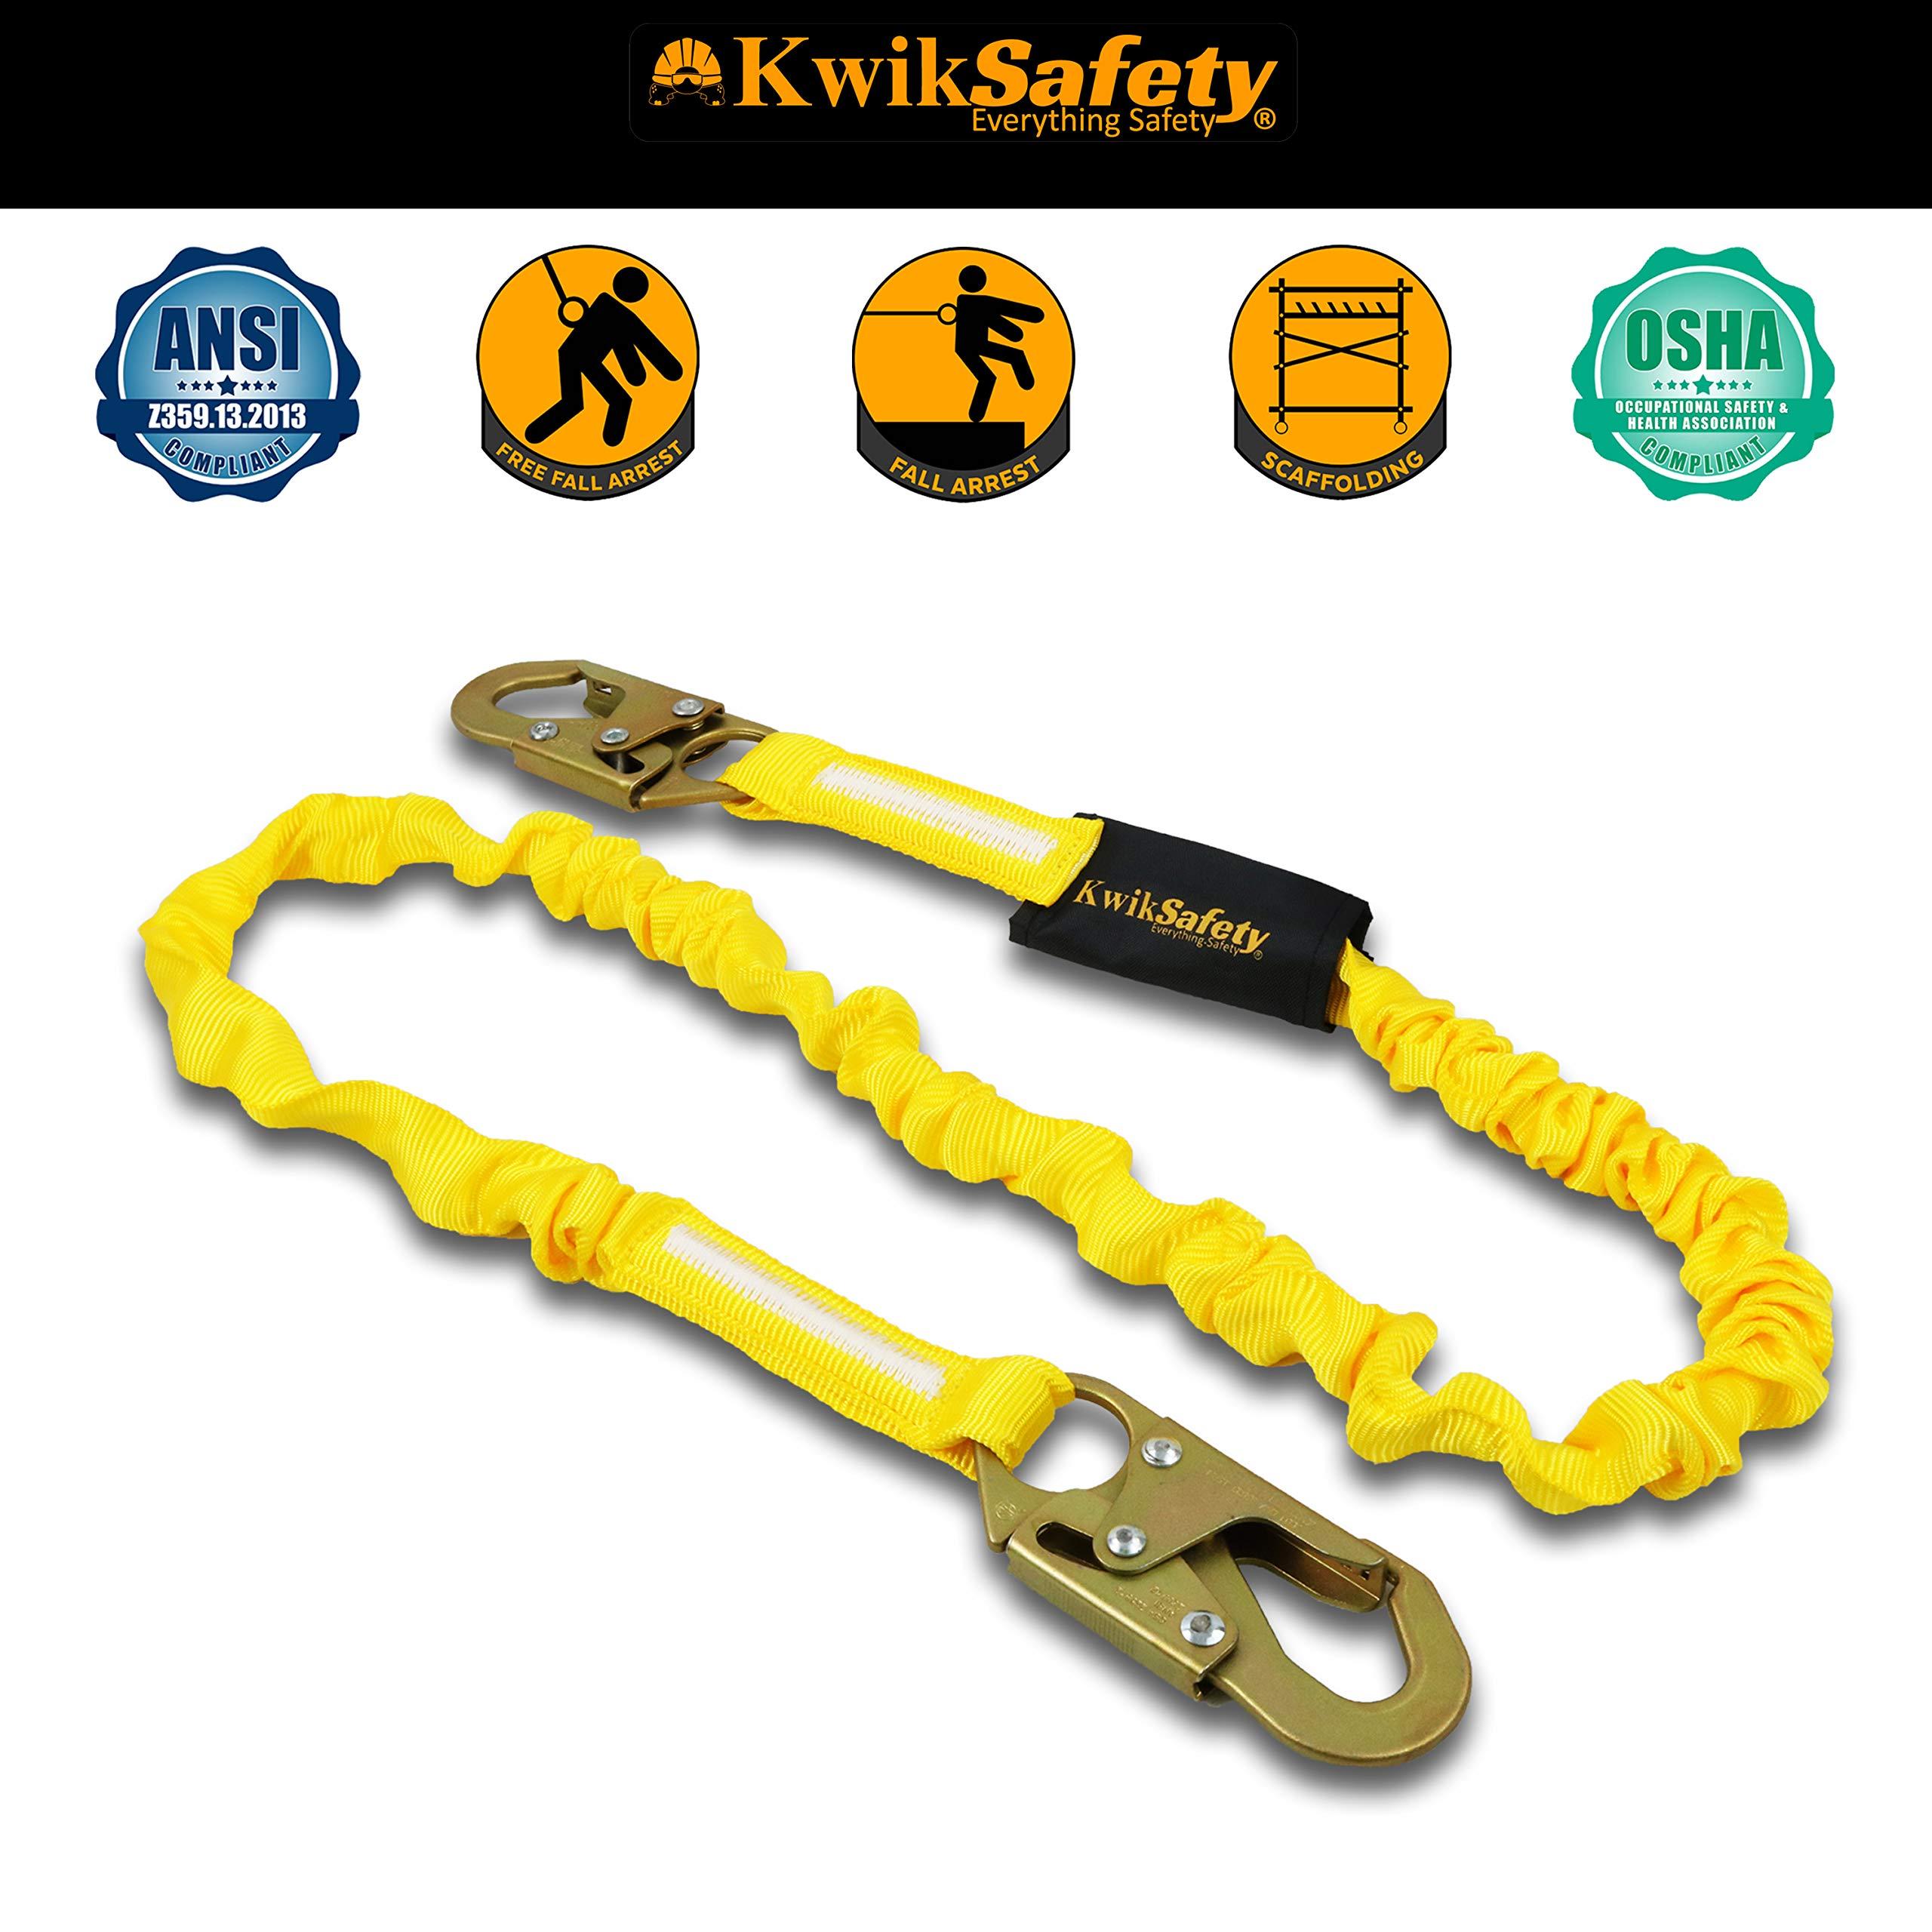 KwikSafety (Charlotte, NC) RATTLER 2 PACK (Internal Shock Absorber) Single Leg 6ft Safety Lanyard, Tool Lanyard OSHA ANSI Fall Protection Equipment Snap Hooks Construction Arborist Roofing by KwikSafety (Image #3)